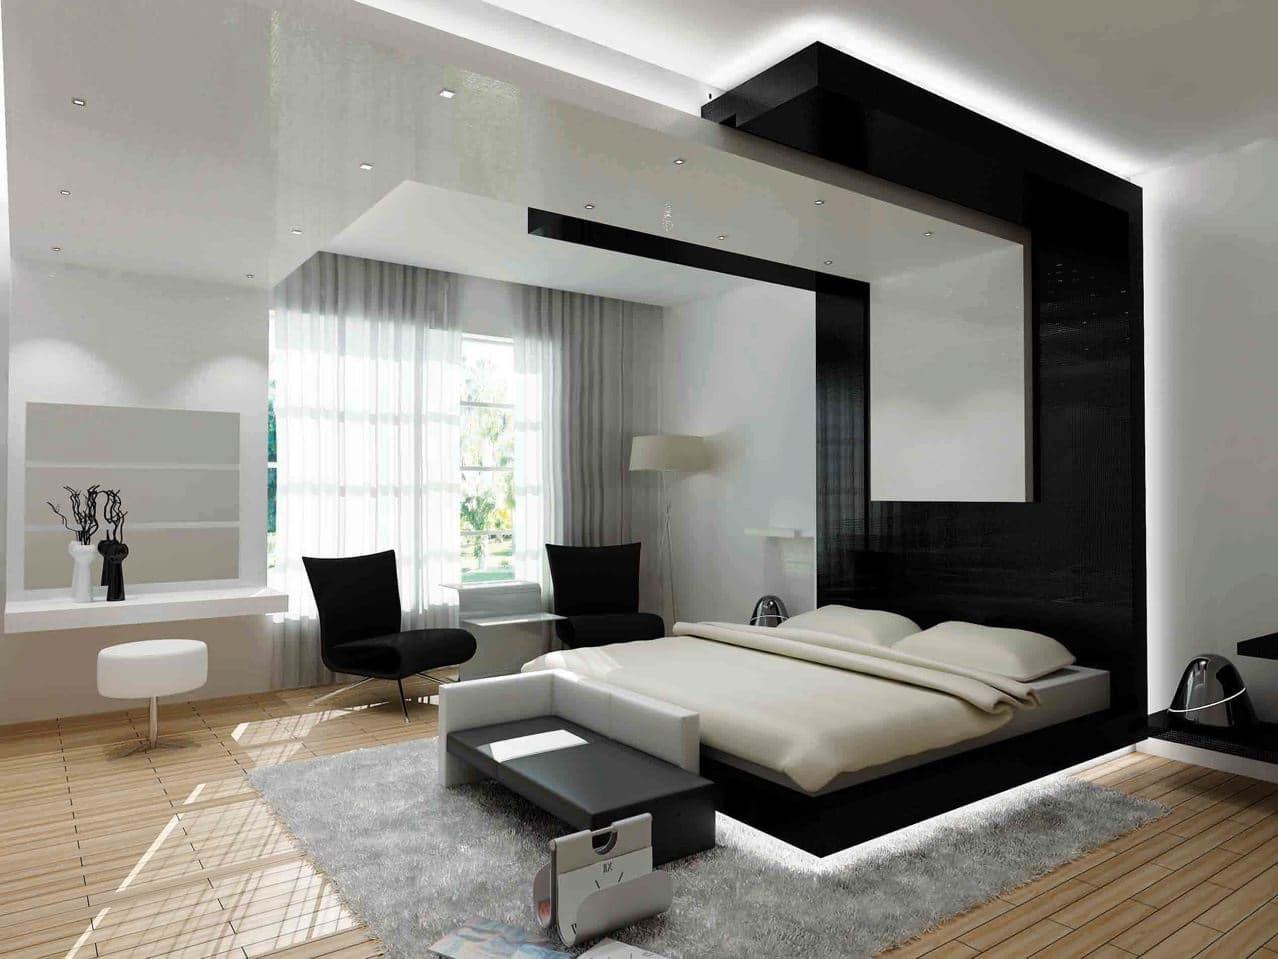 60 Dormitorios De Matrimonio Modernos Que Te Encantaran Estreno Casa - Como-decorar-una-habitacion-de-matrimonio-moderna